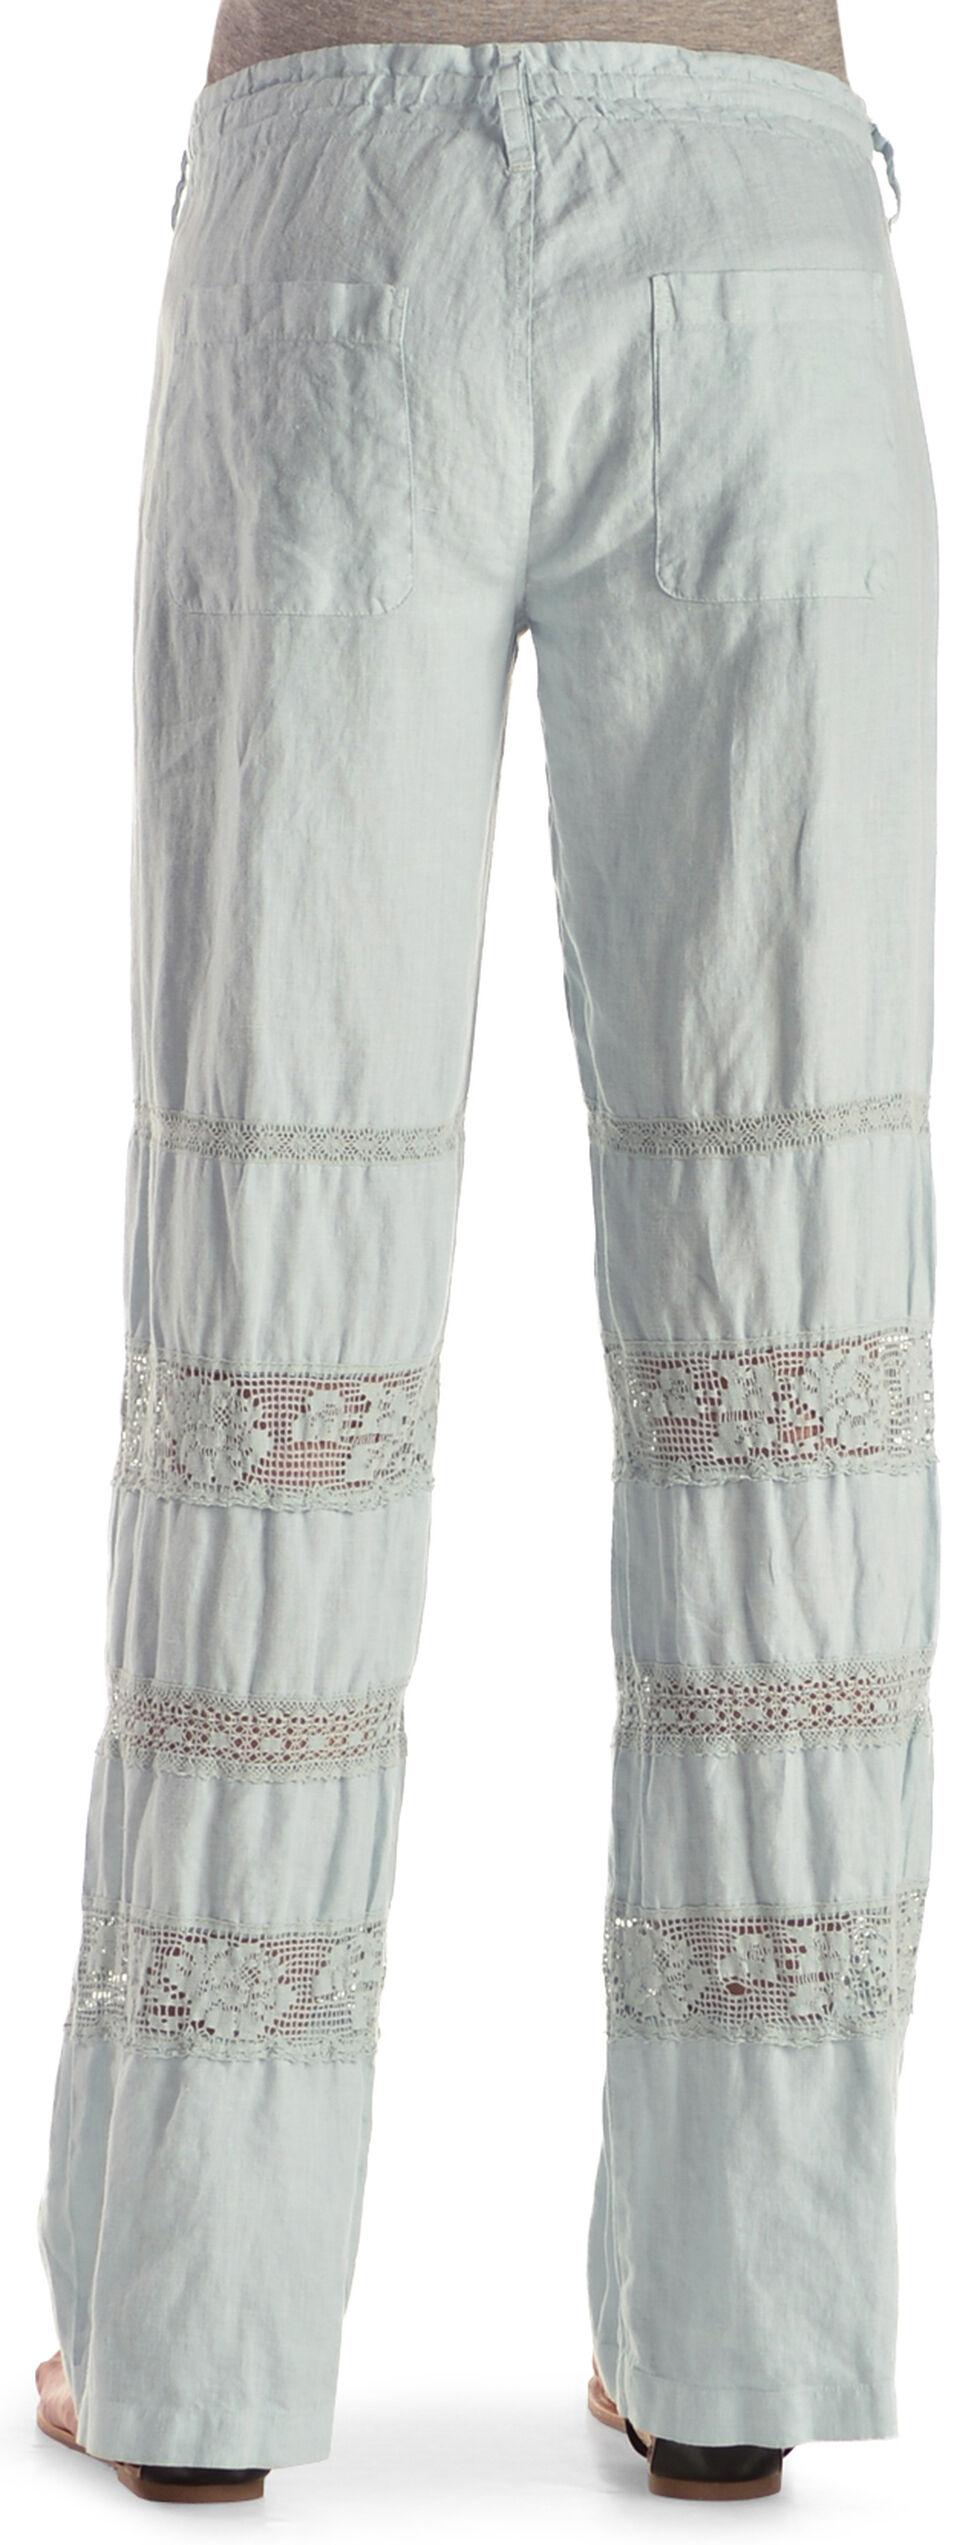 Johnny Was Women's Crochet Insert Linen Pants, Seafoam, hi-res